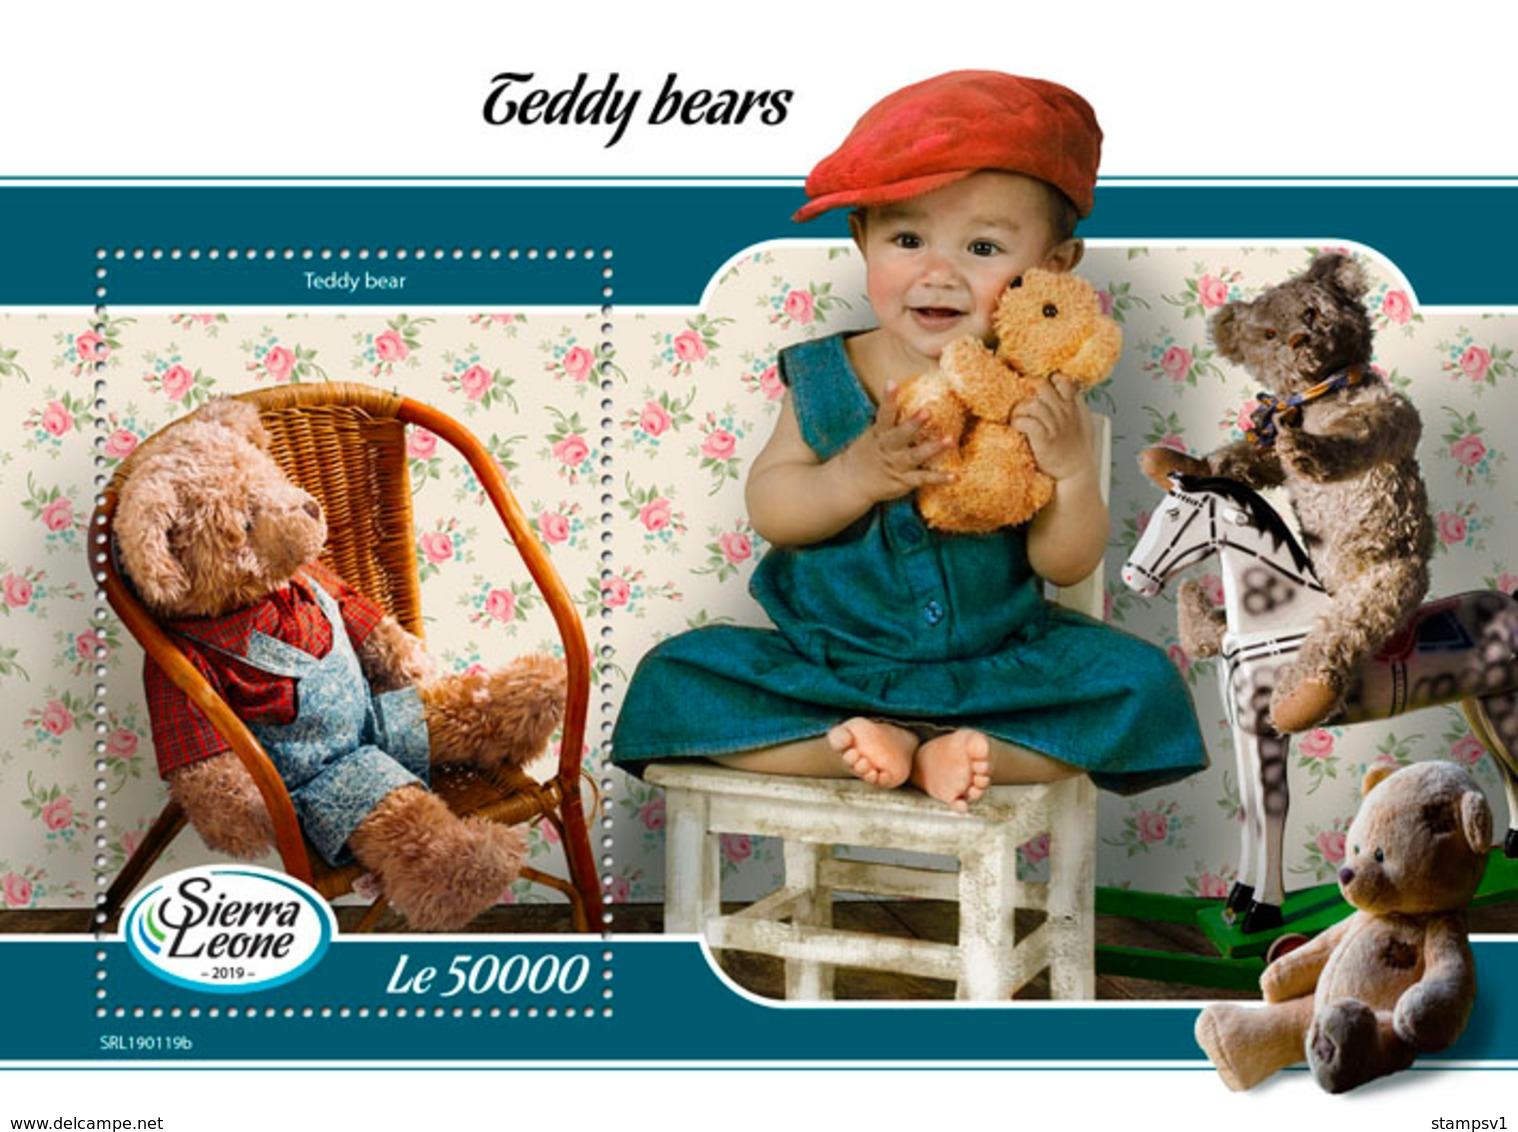 Sierra Leone. 2019 Teddy Bears. (0119b)  OFFICIAL ISSUE - Poupées